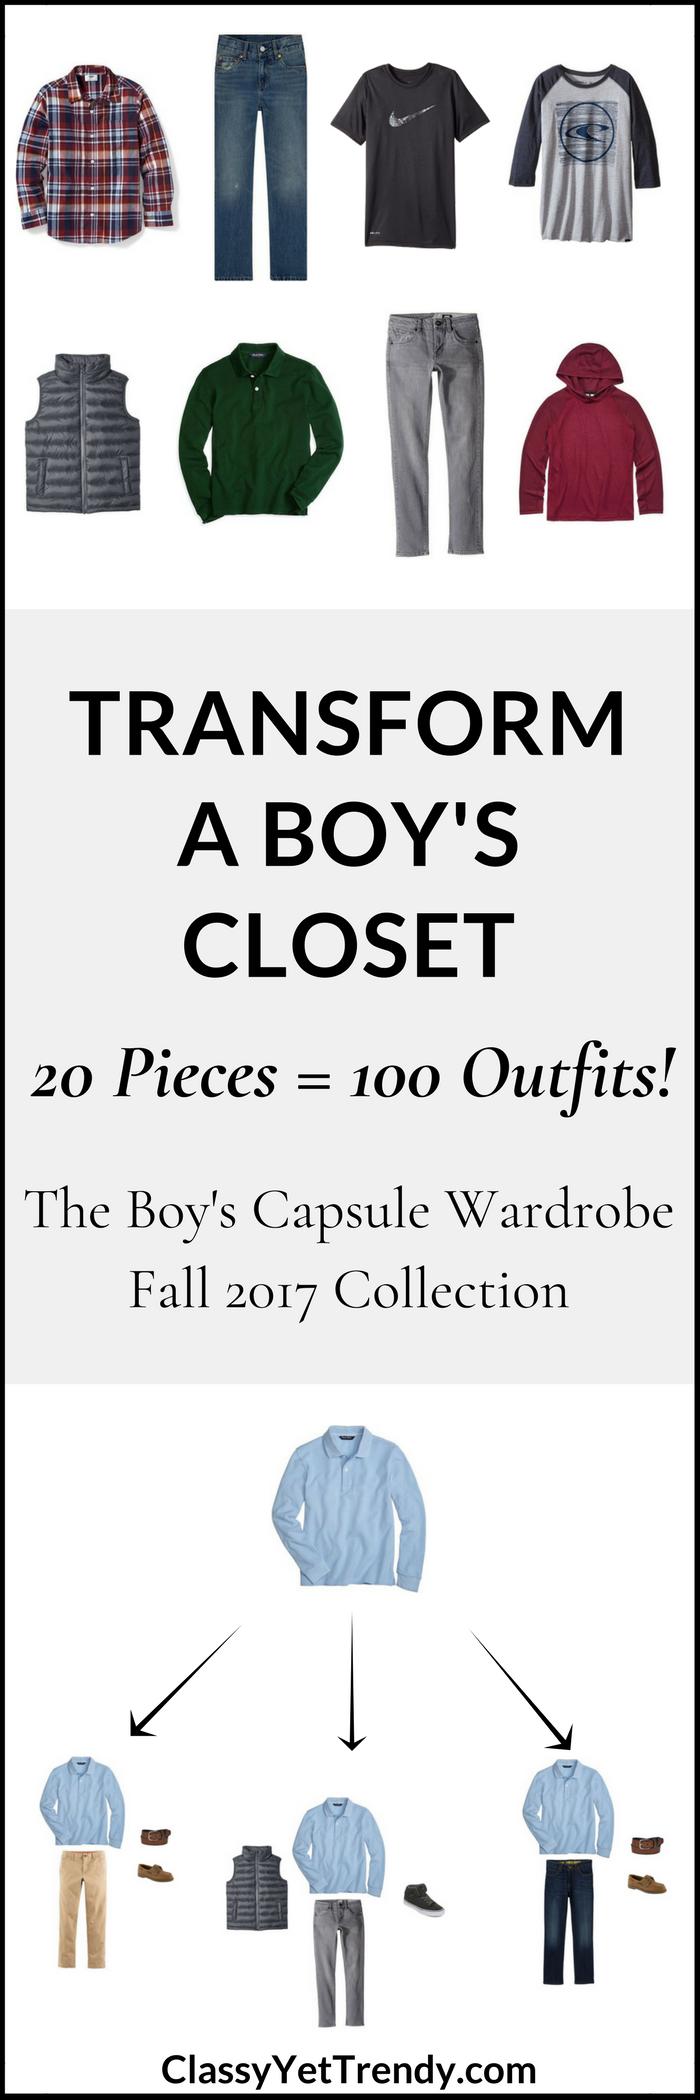 Boy's Capsule Wardrobe - Fall 2017